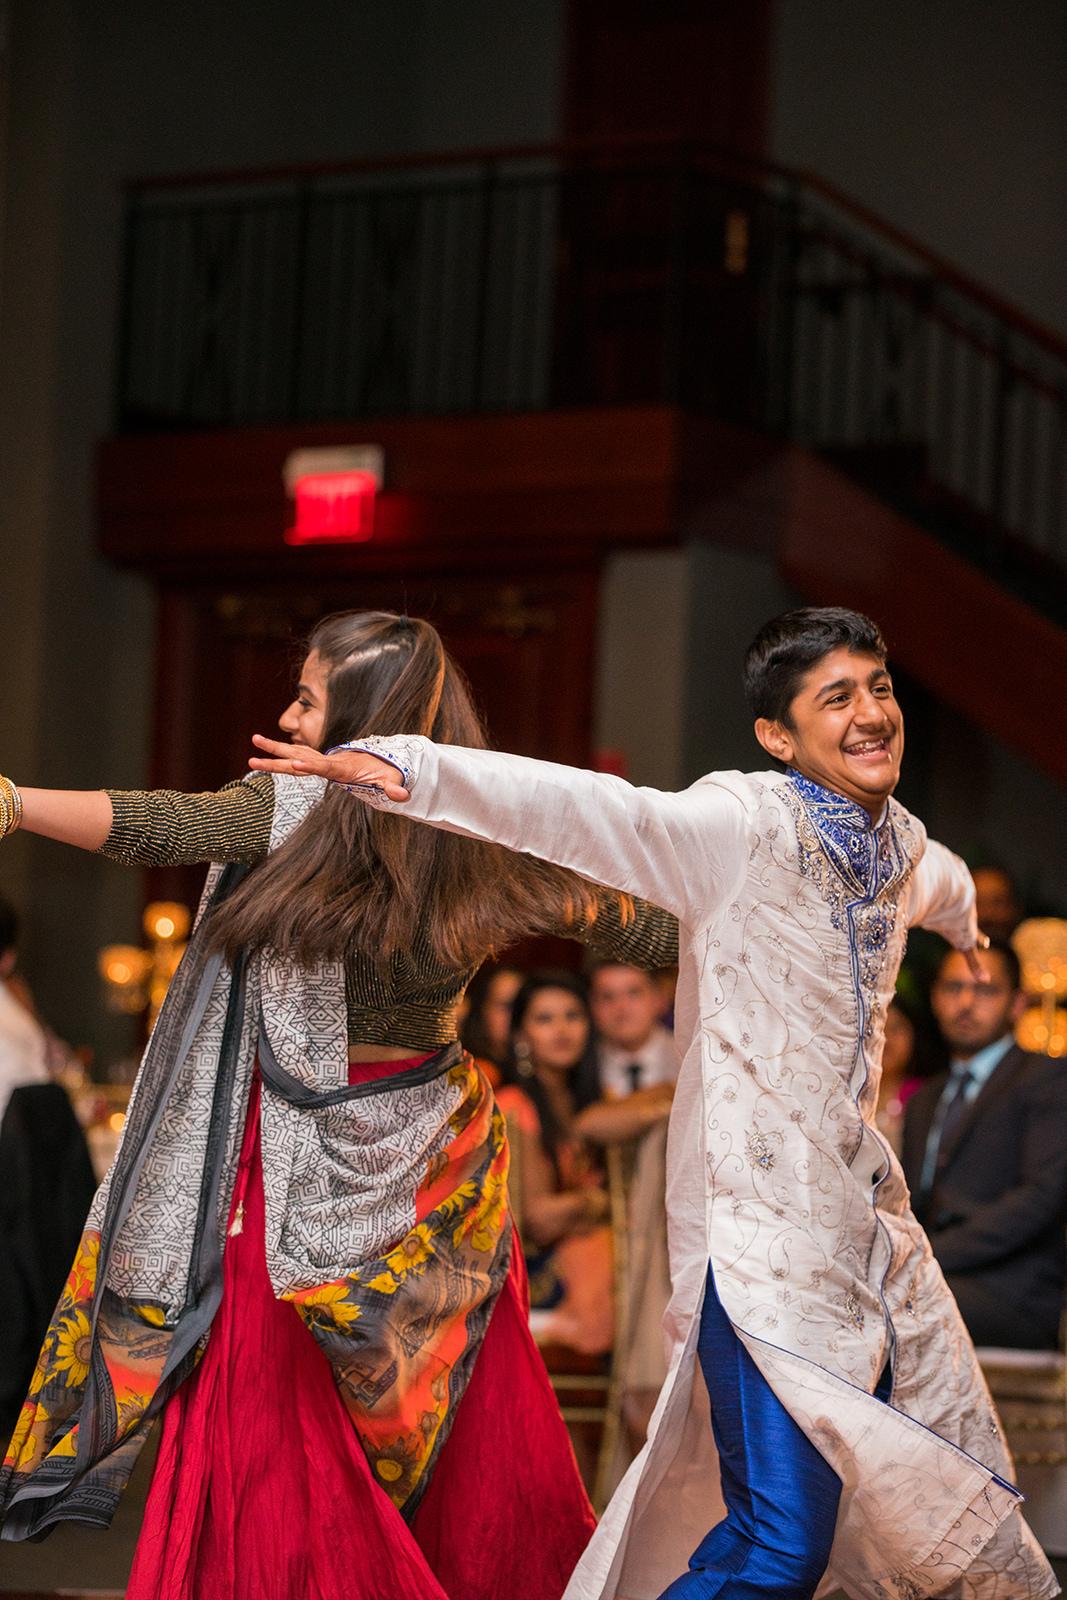 Le Cape Weddings - South Asian Wedding - Ishani and Sidhart - Wedding Reception-96.jpg